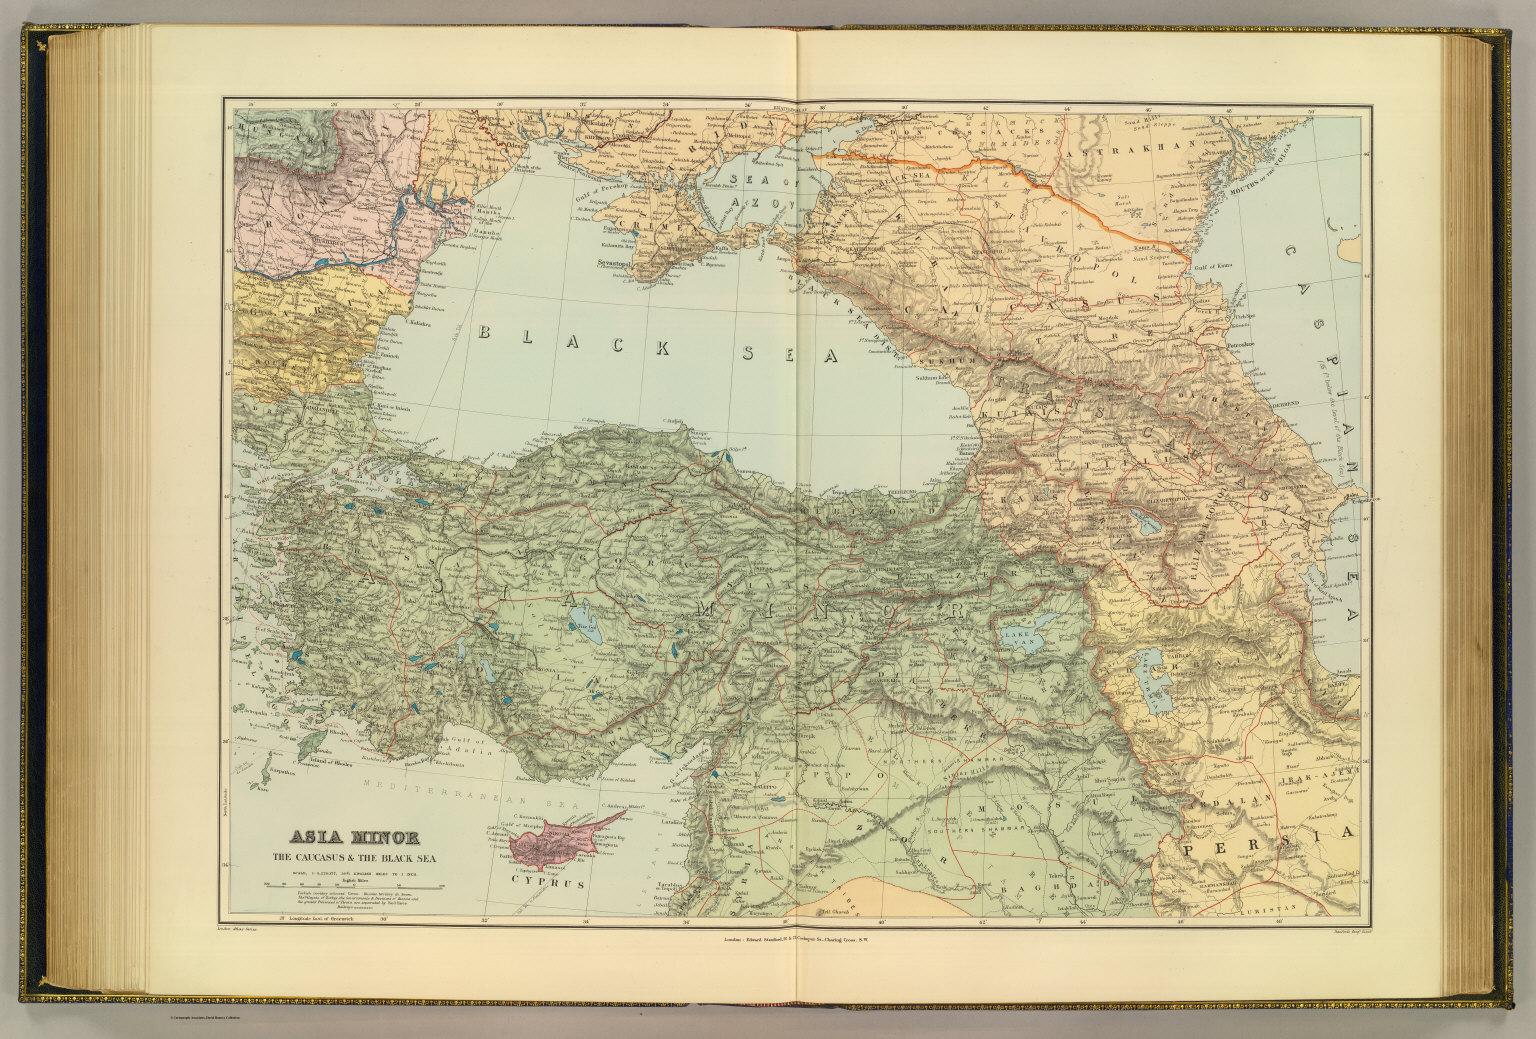 asia minor caucasus black sea david rumsey historical map collection